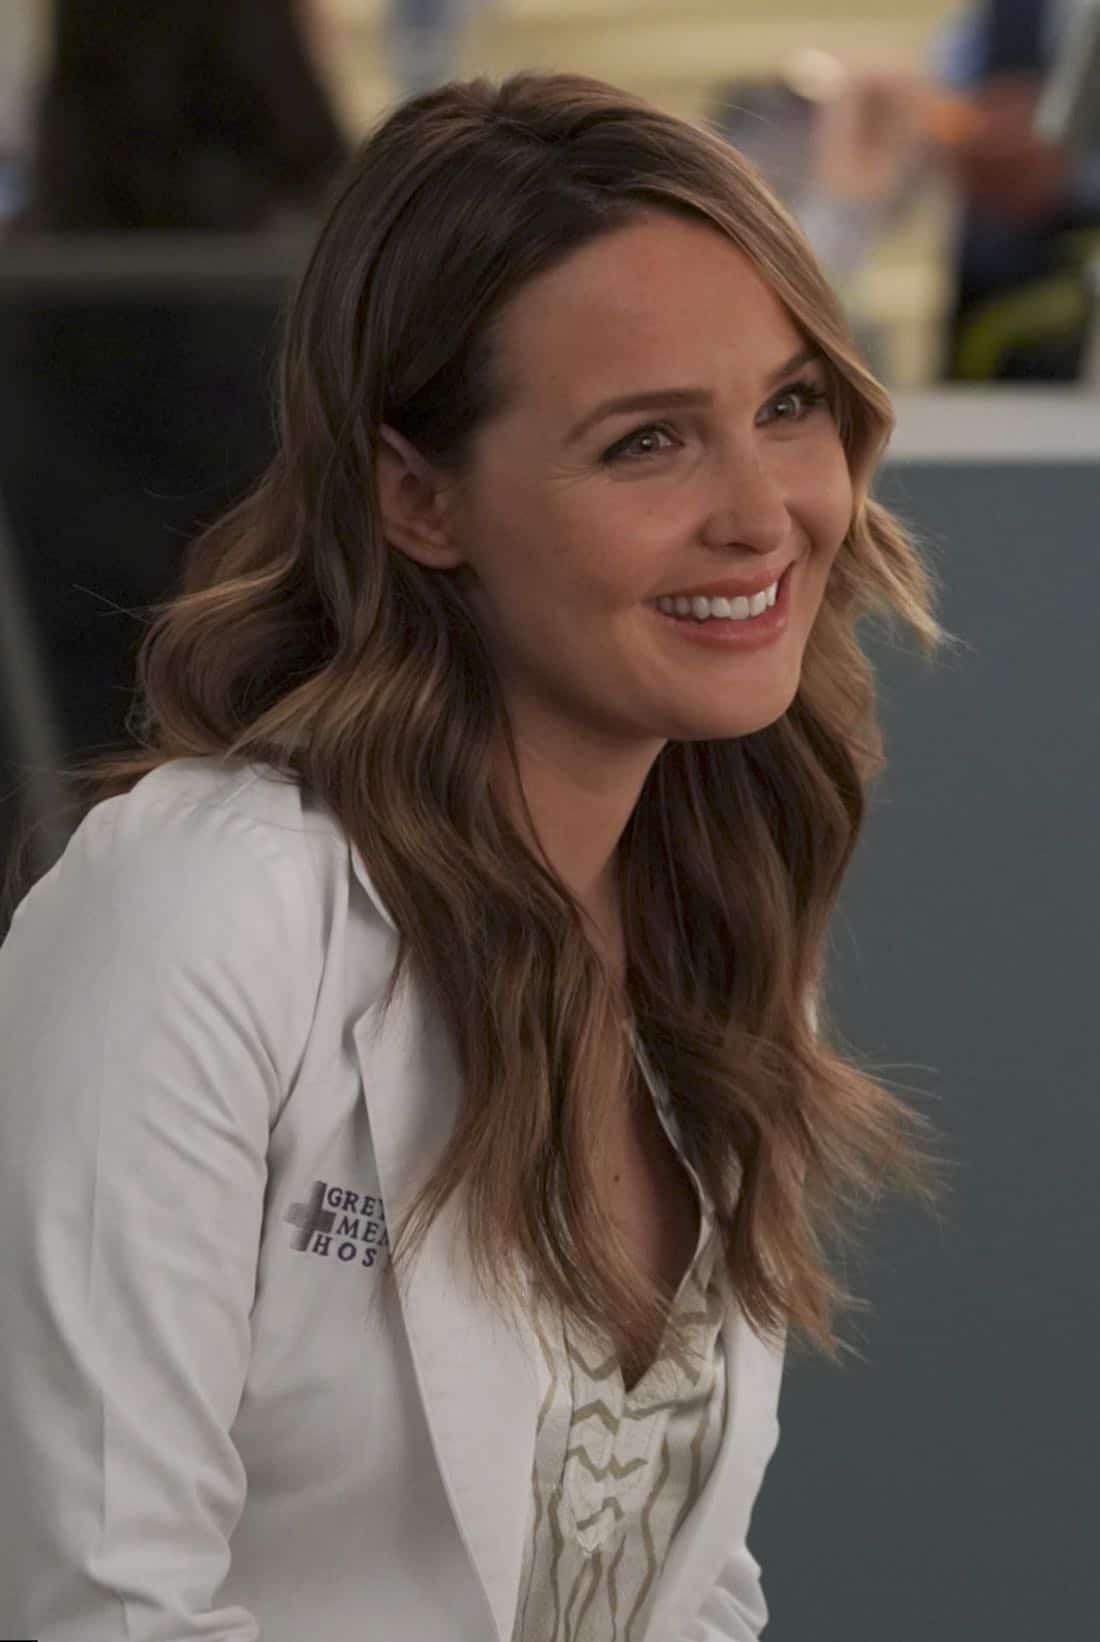 Greys Anatomy Episode 14 Season 14 Games People Play 14